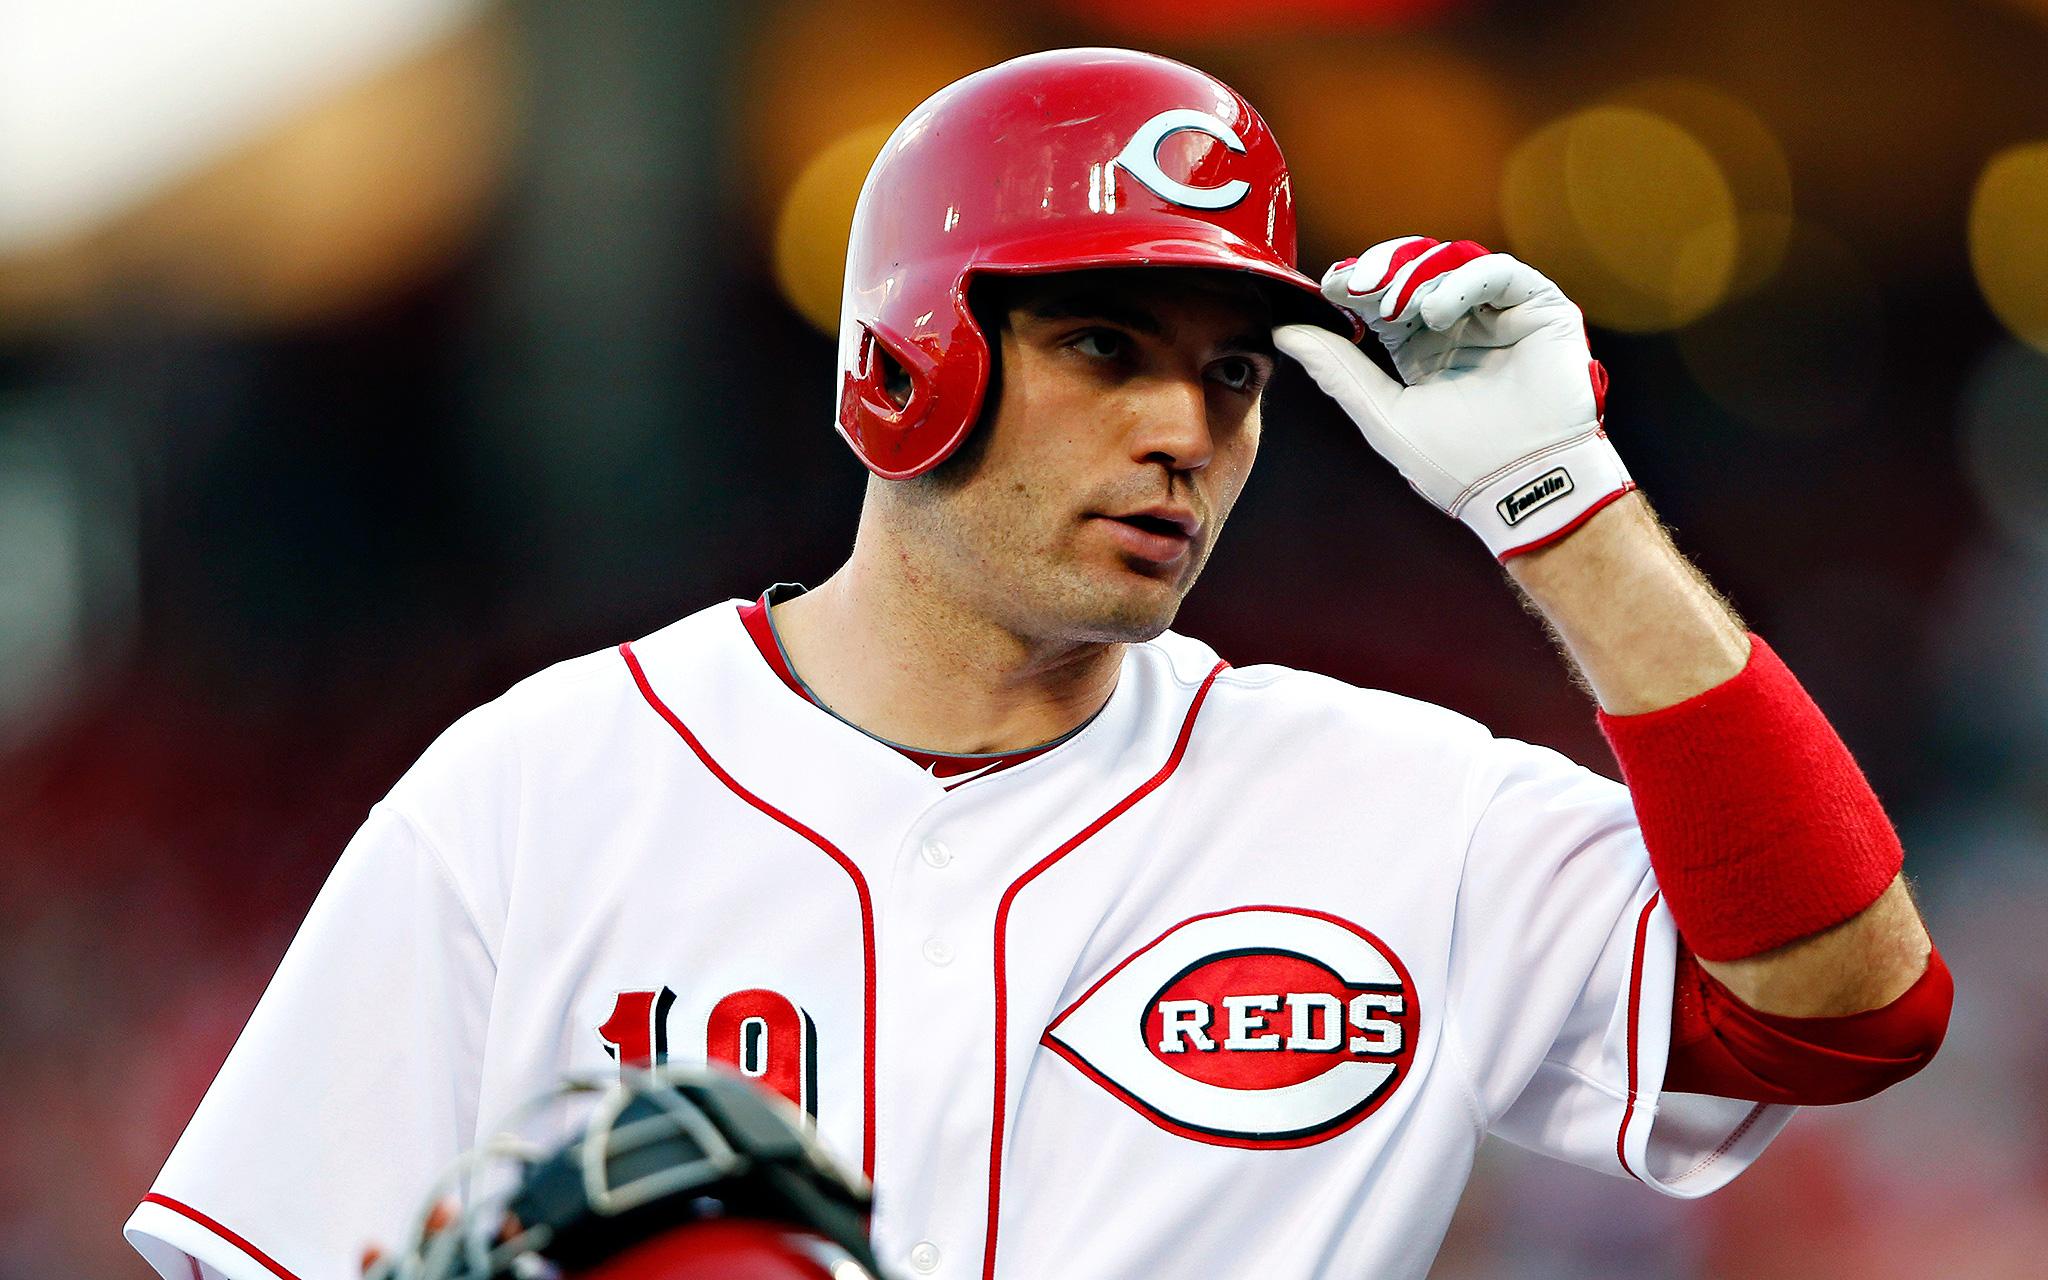 7. Joey Votto, Reds - 2 percent